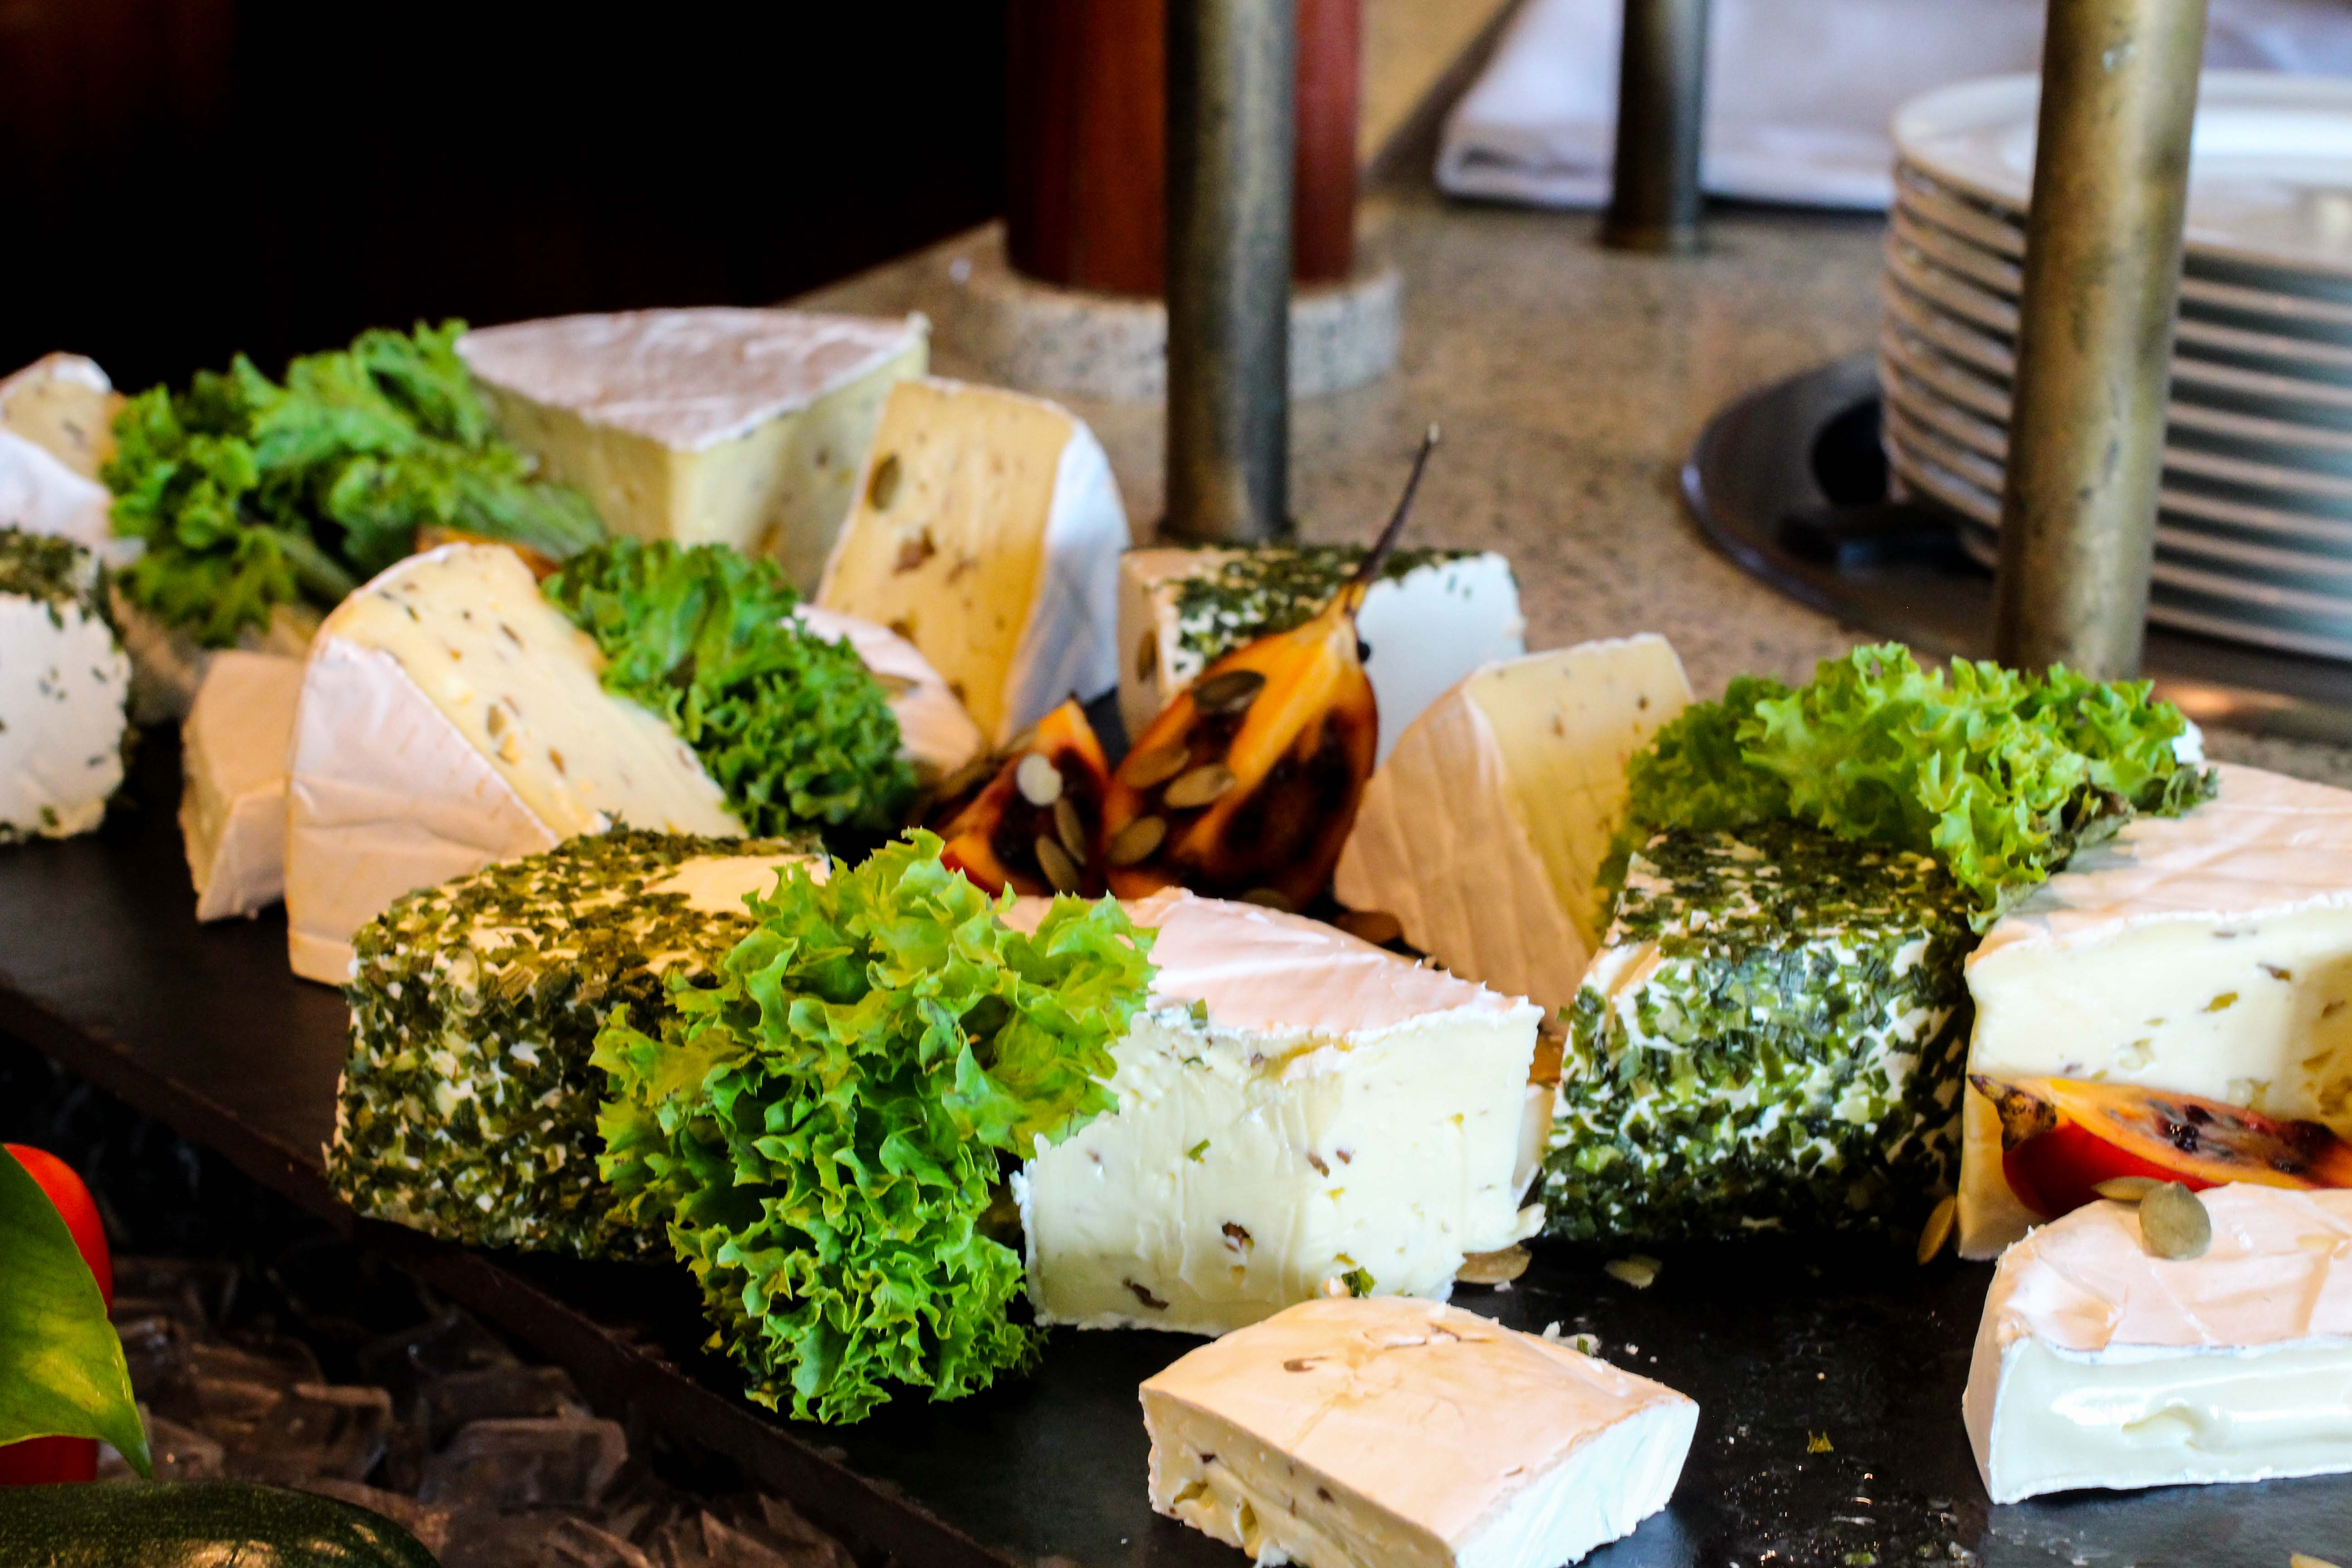 Donaukreuzfahrt A-Rosa Bella Restaurant Buffet Käse Flusskreuzfahrt Flusskreuzfahrtschiff 7 Tage Donau Klassik Tour Arosa Reiseblogger